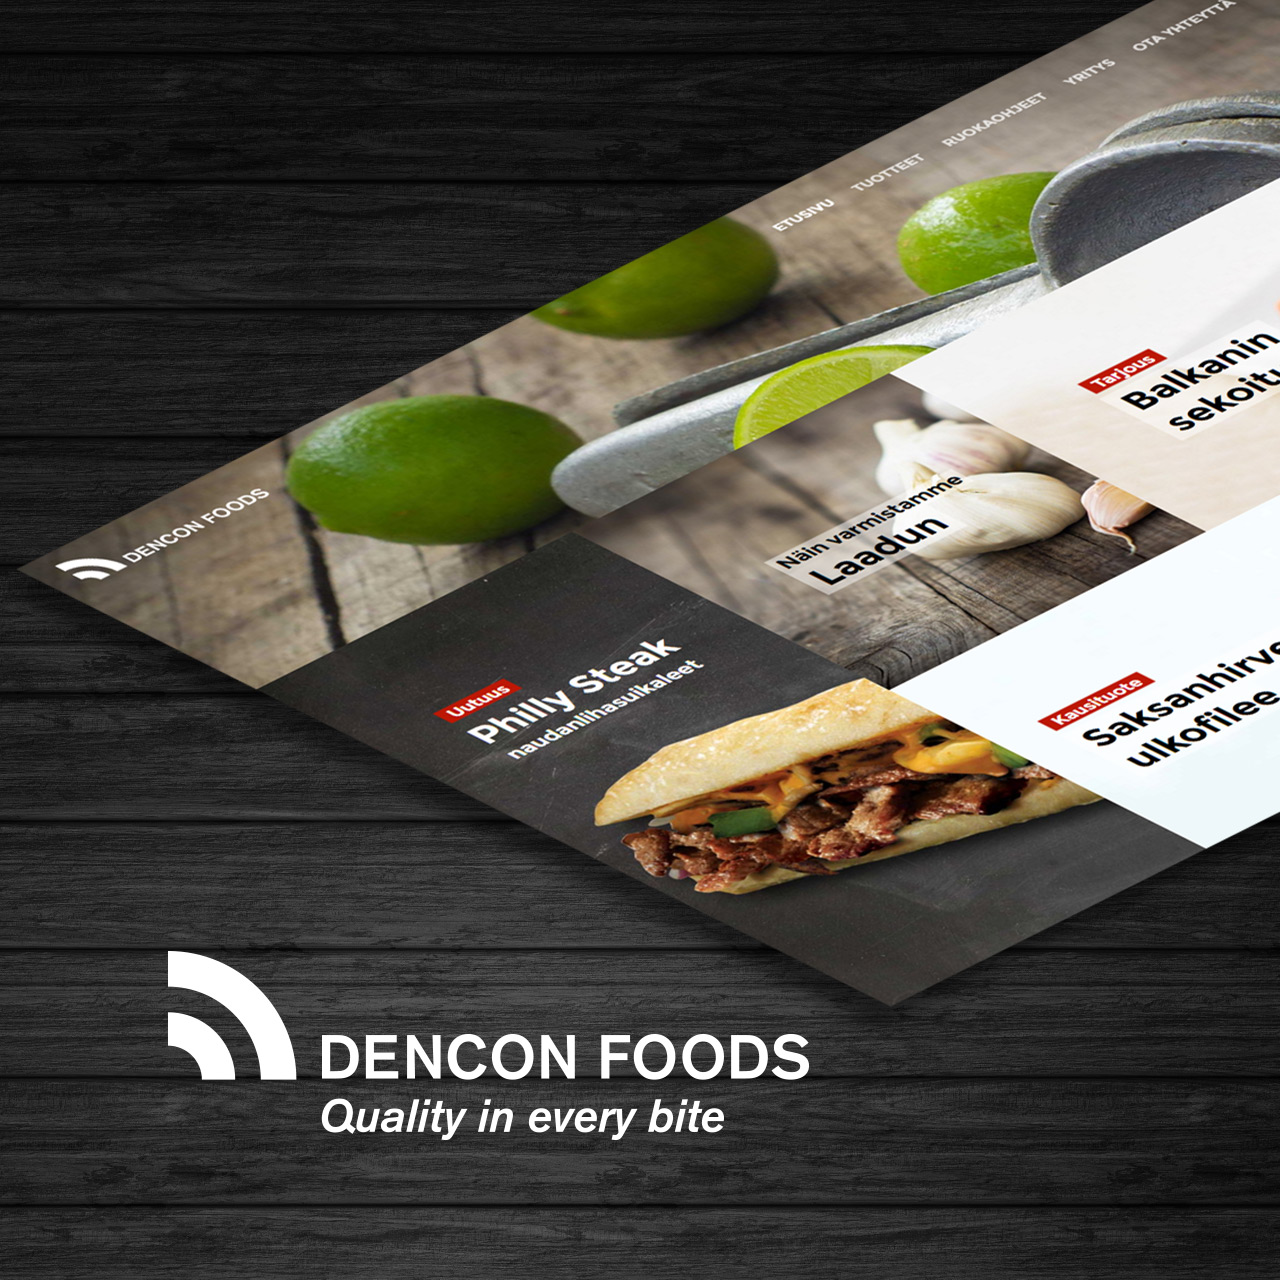 Dencon Foods